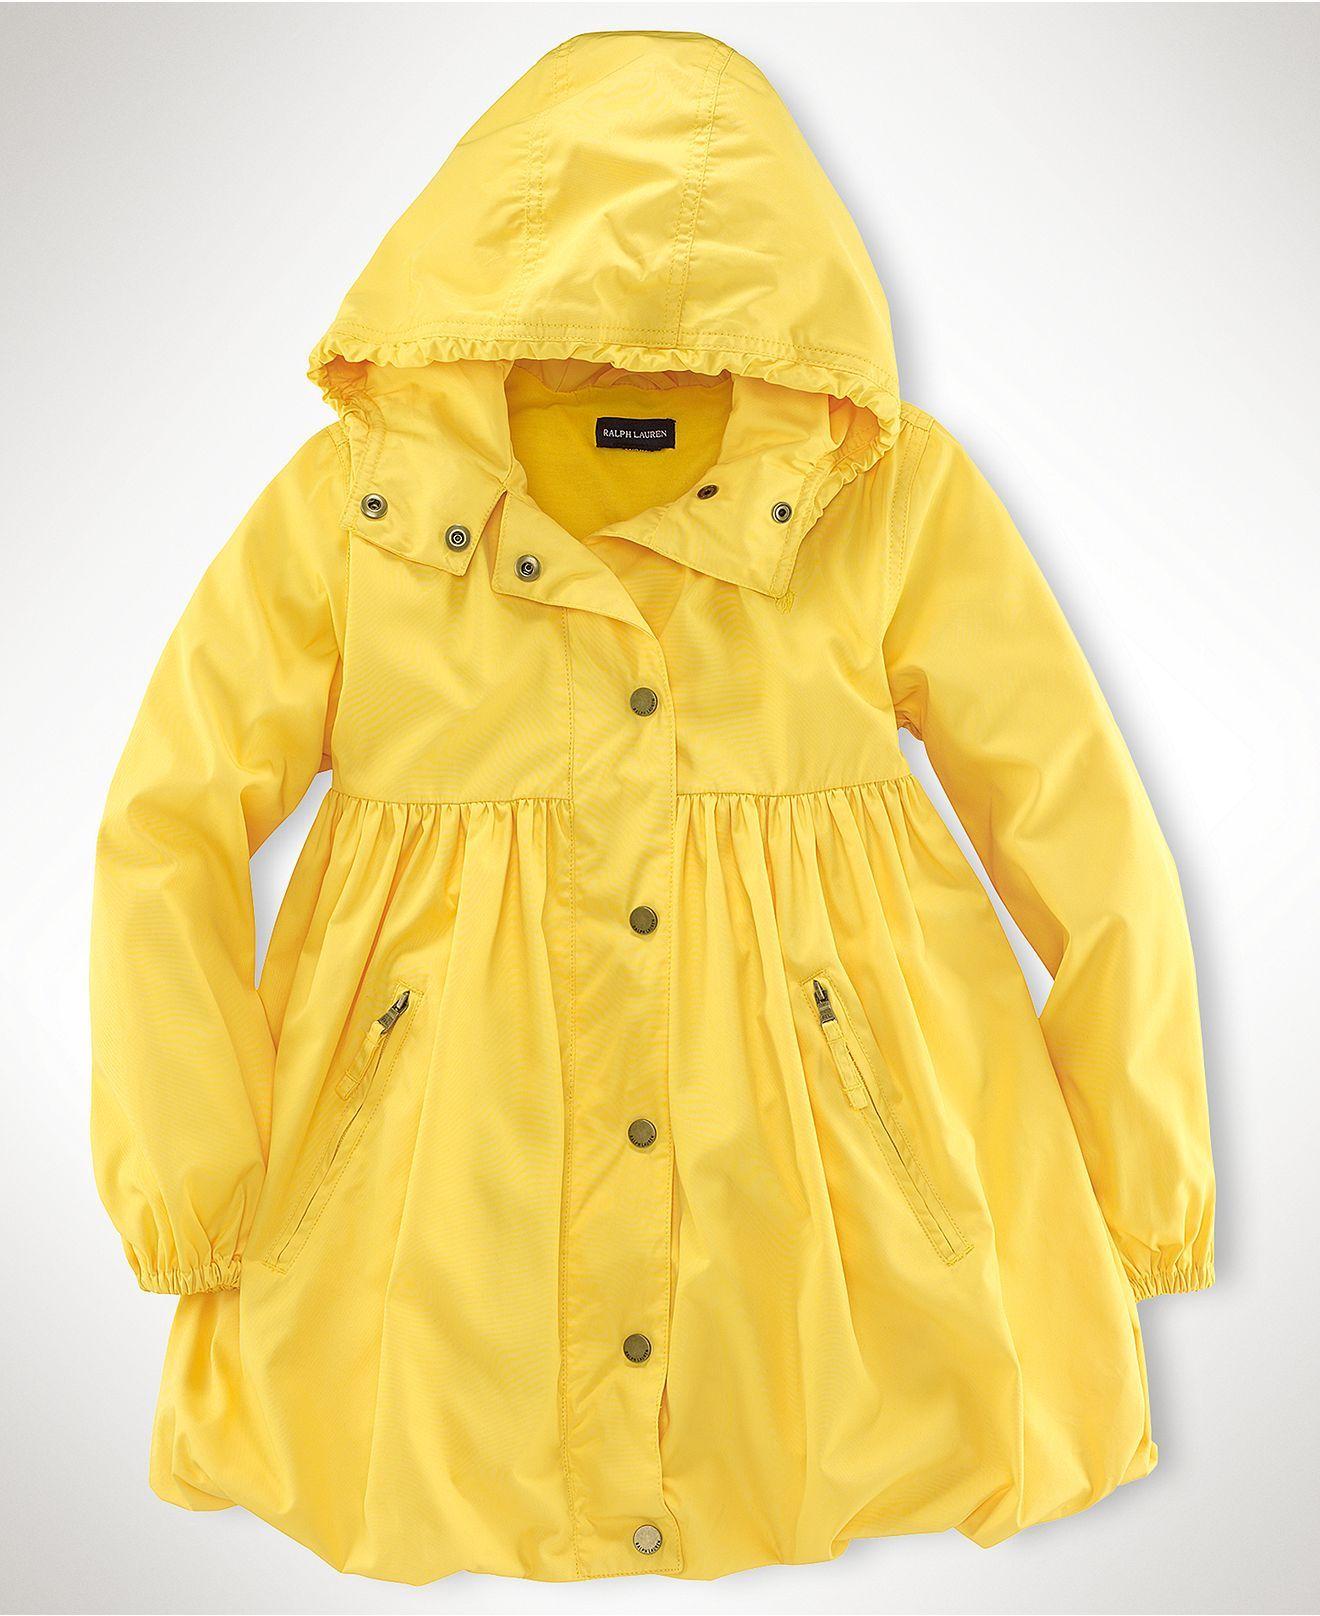 19ba3805b Classic yellow raincoat with a feminine twist - so darling! Ralph Lauren  Kids Jacket, Little Girls Raincoats - Kids - Macy's $89.50 #MacysBTS